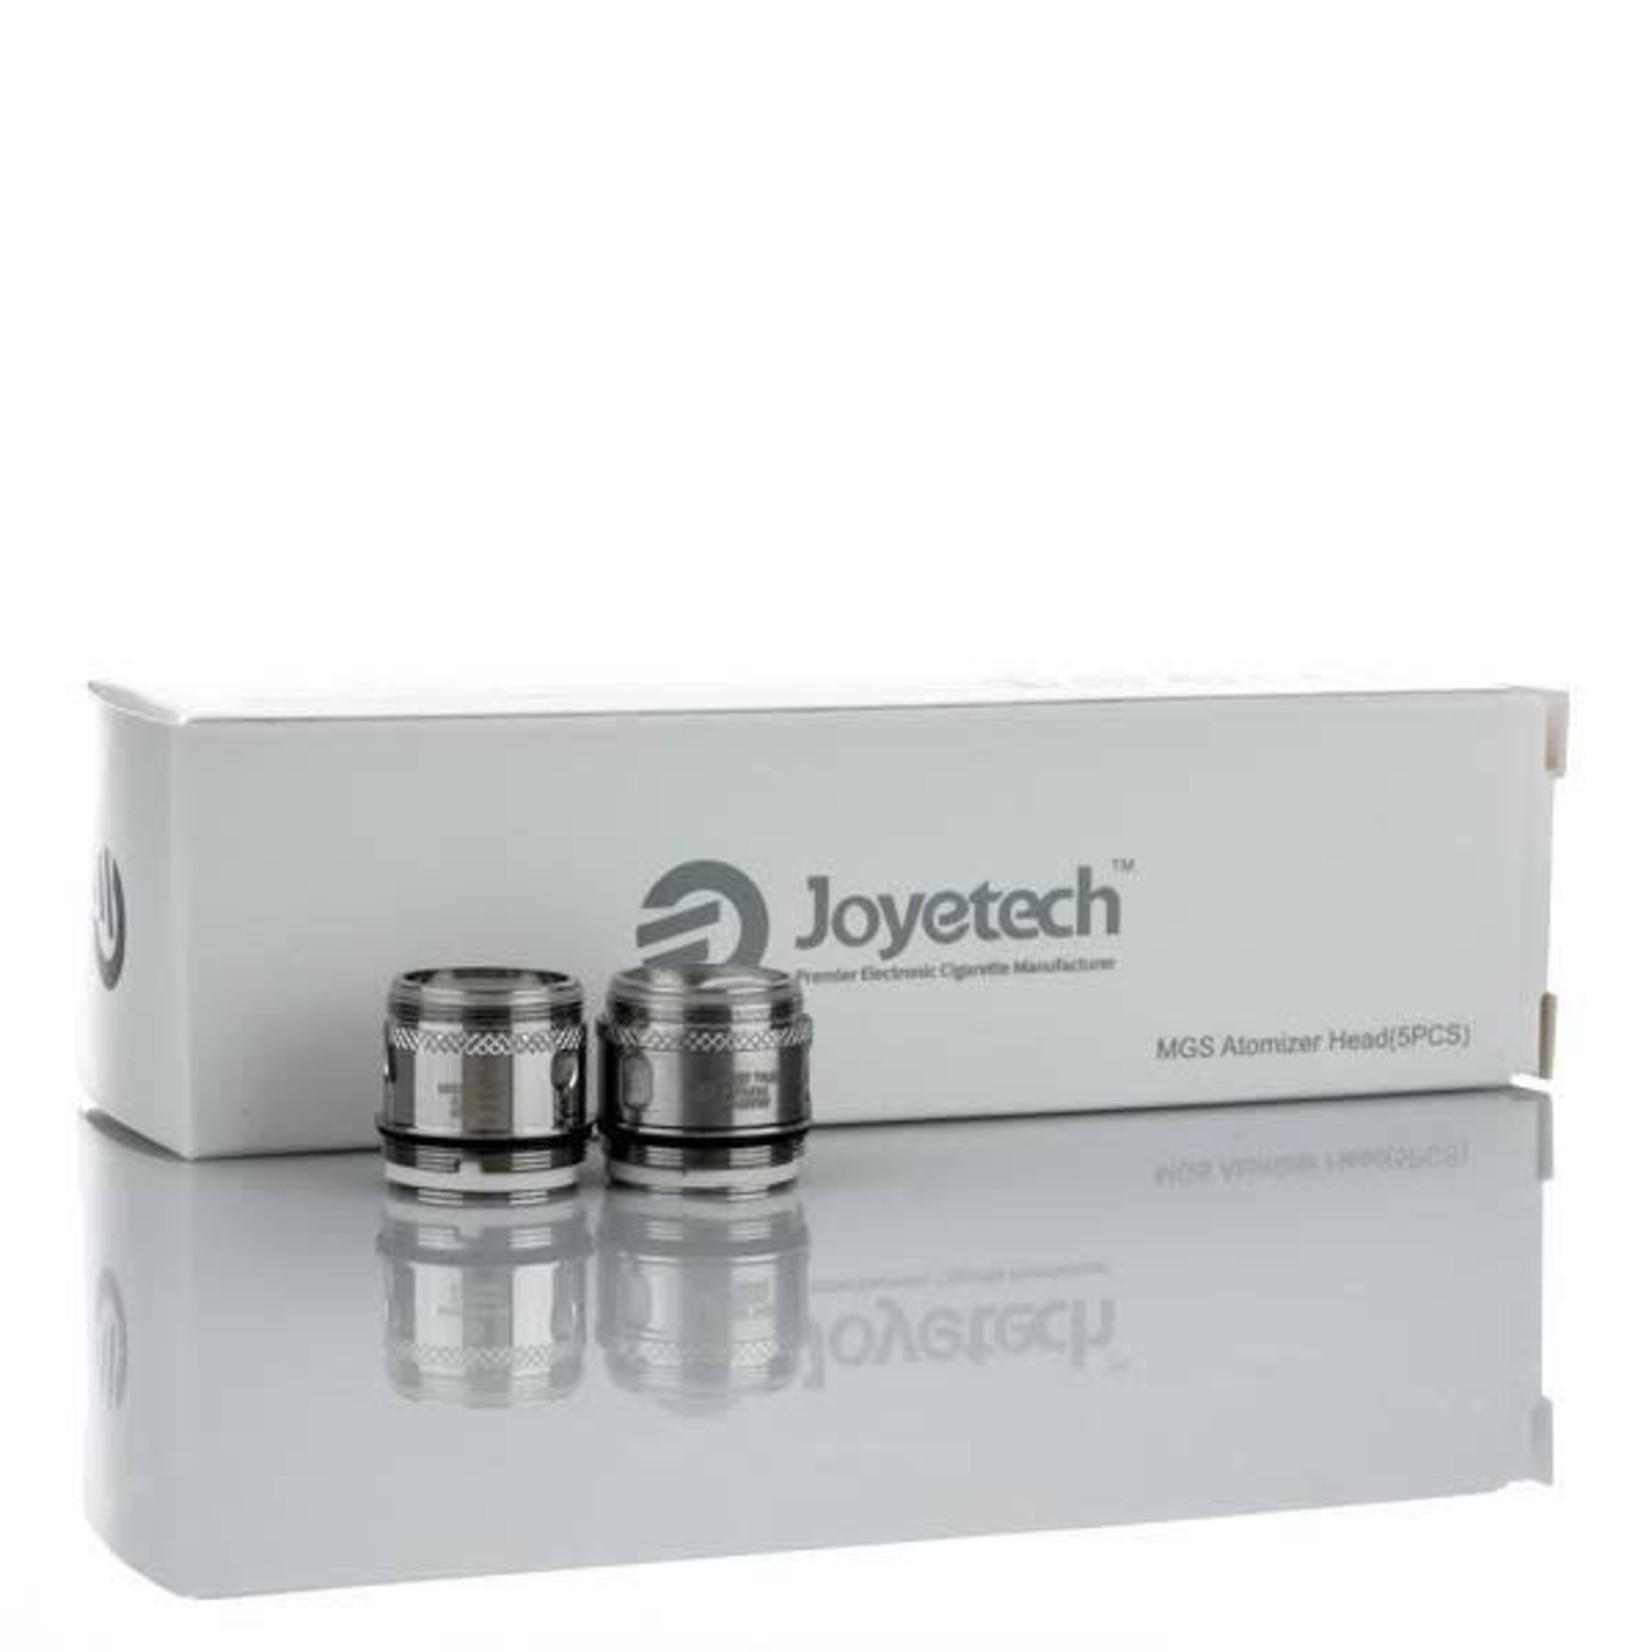 joyetech Ornate Coils MGS SS316L 0.15 ohm Pack ( 5pcs )